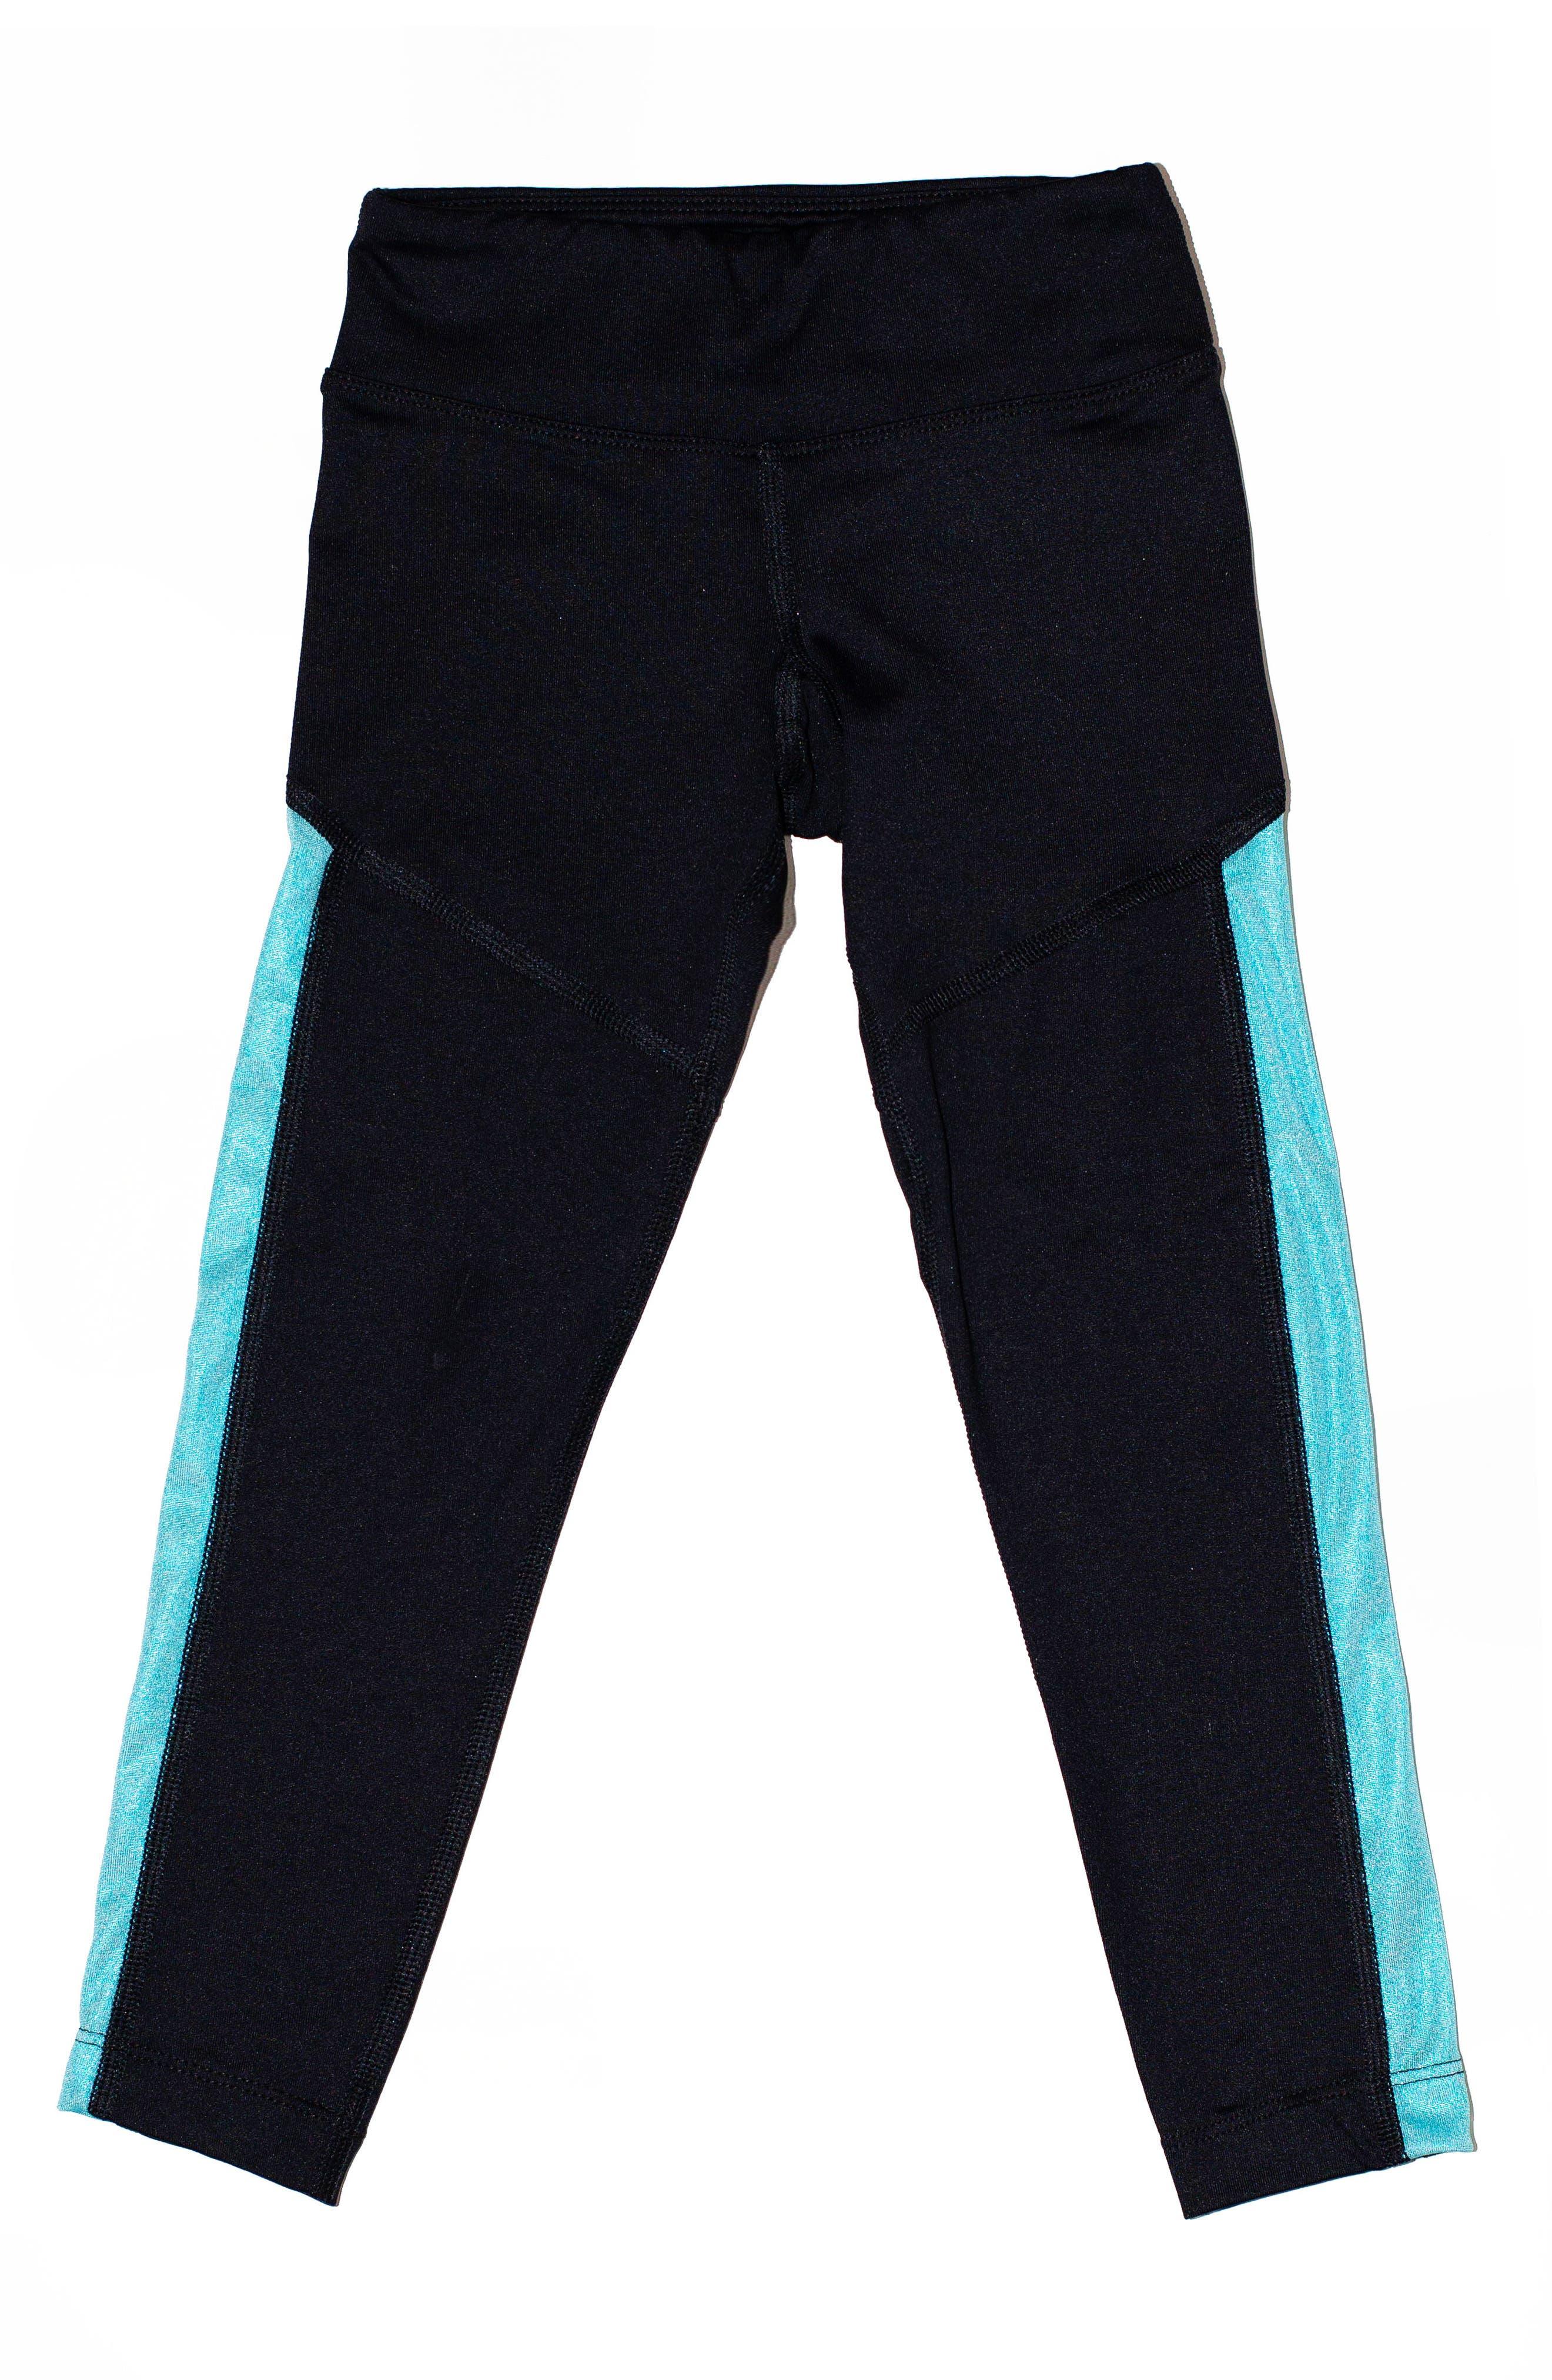 MIRA RAE,                             Zara Colorblock Leggings,                             Main thumbnail 1, color,                             001